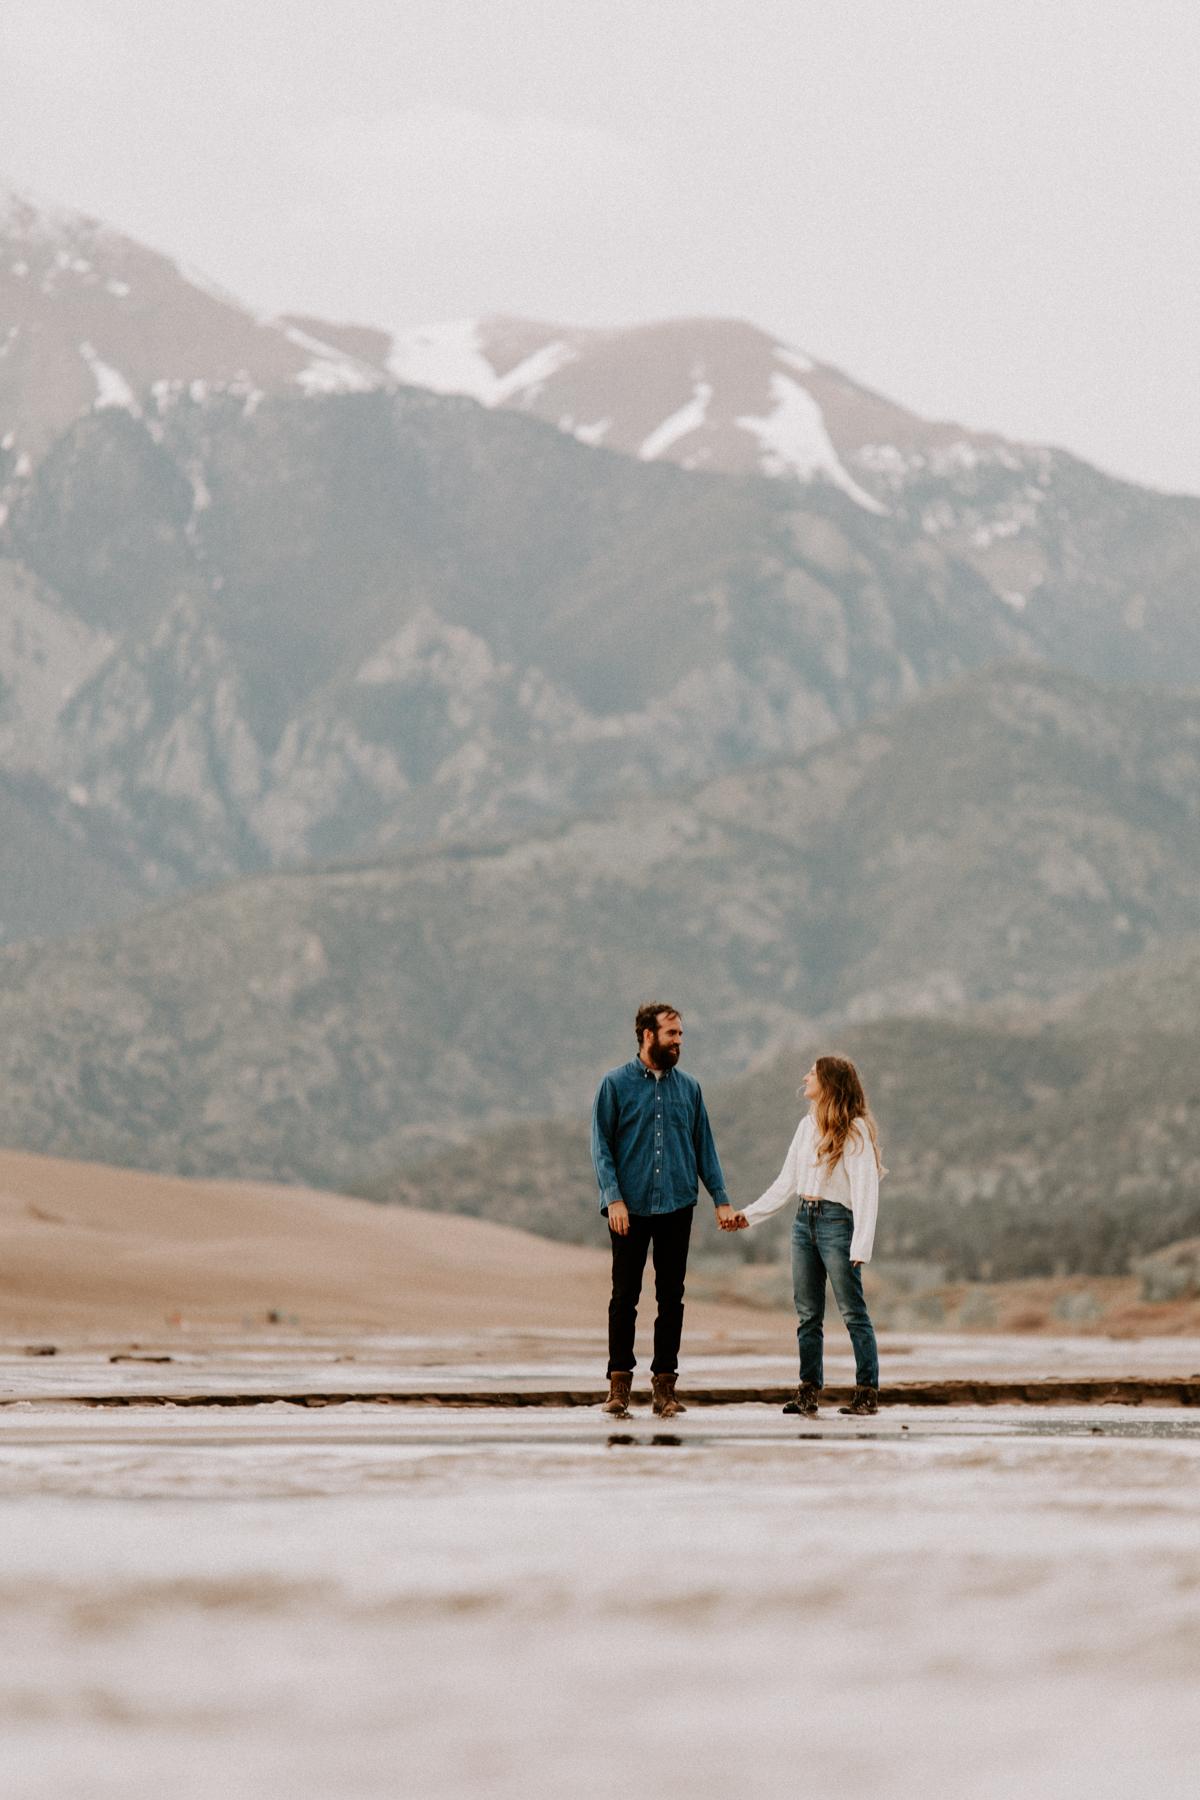 S + J Great Sand Dunes National Park Engagement Photography Photographer Wedding Alamosa Colorado-4.jpg